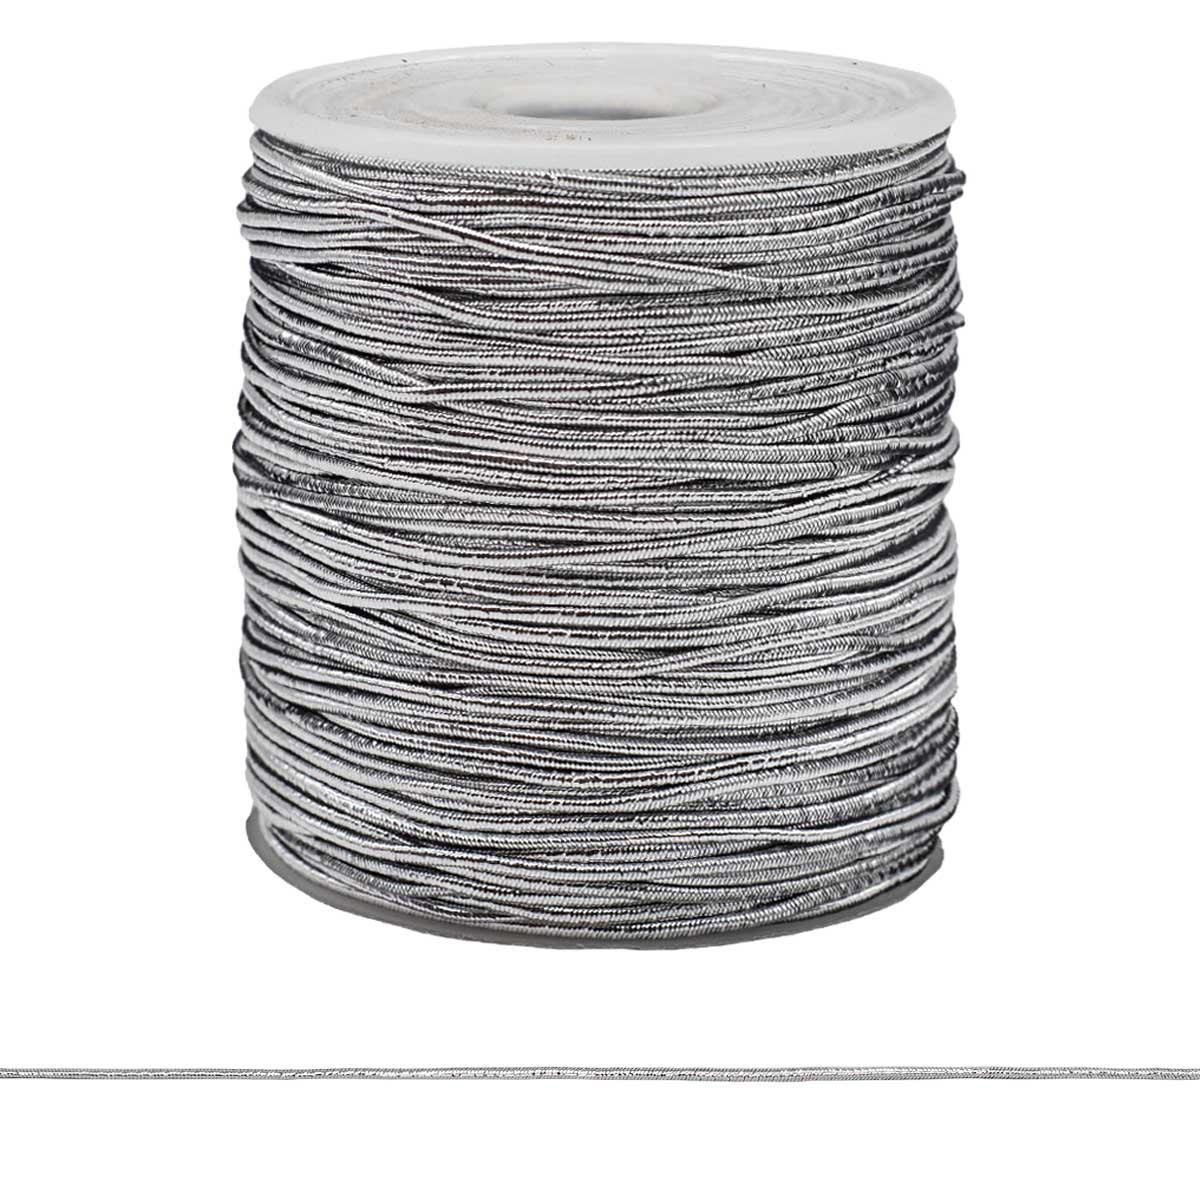 Шнур эластичный 0370-6100 1,0мм металлизированный